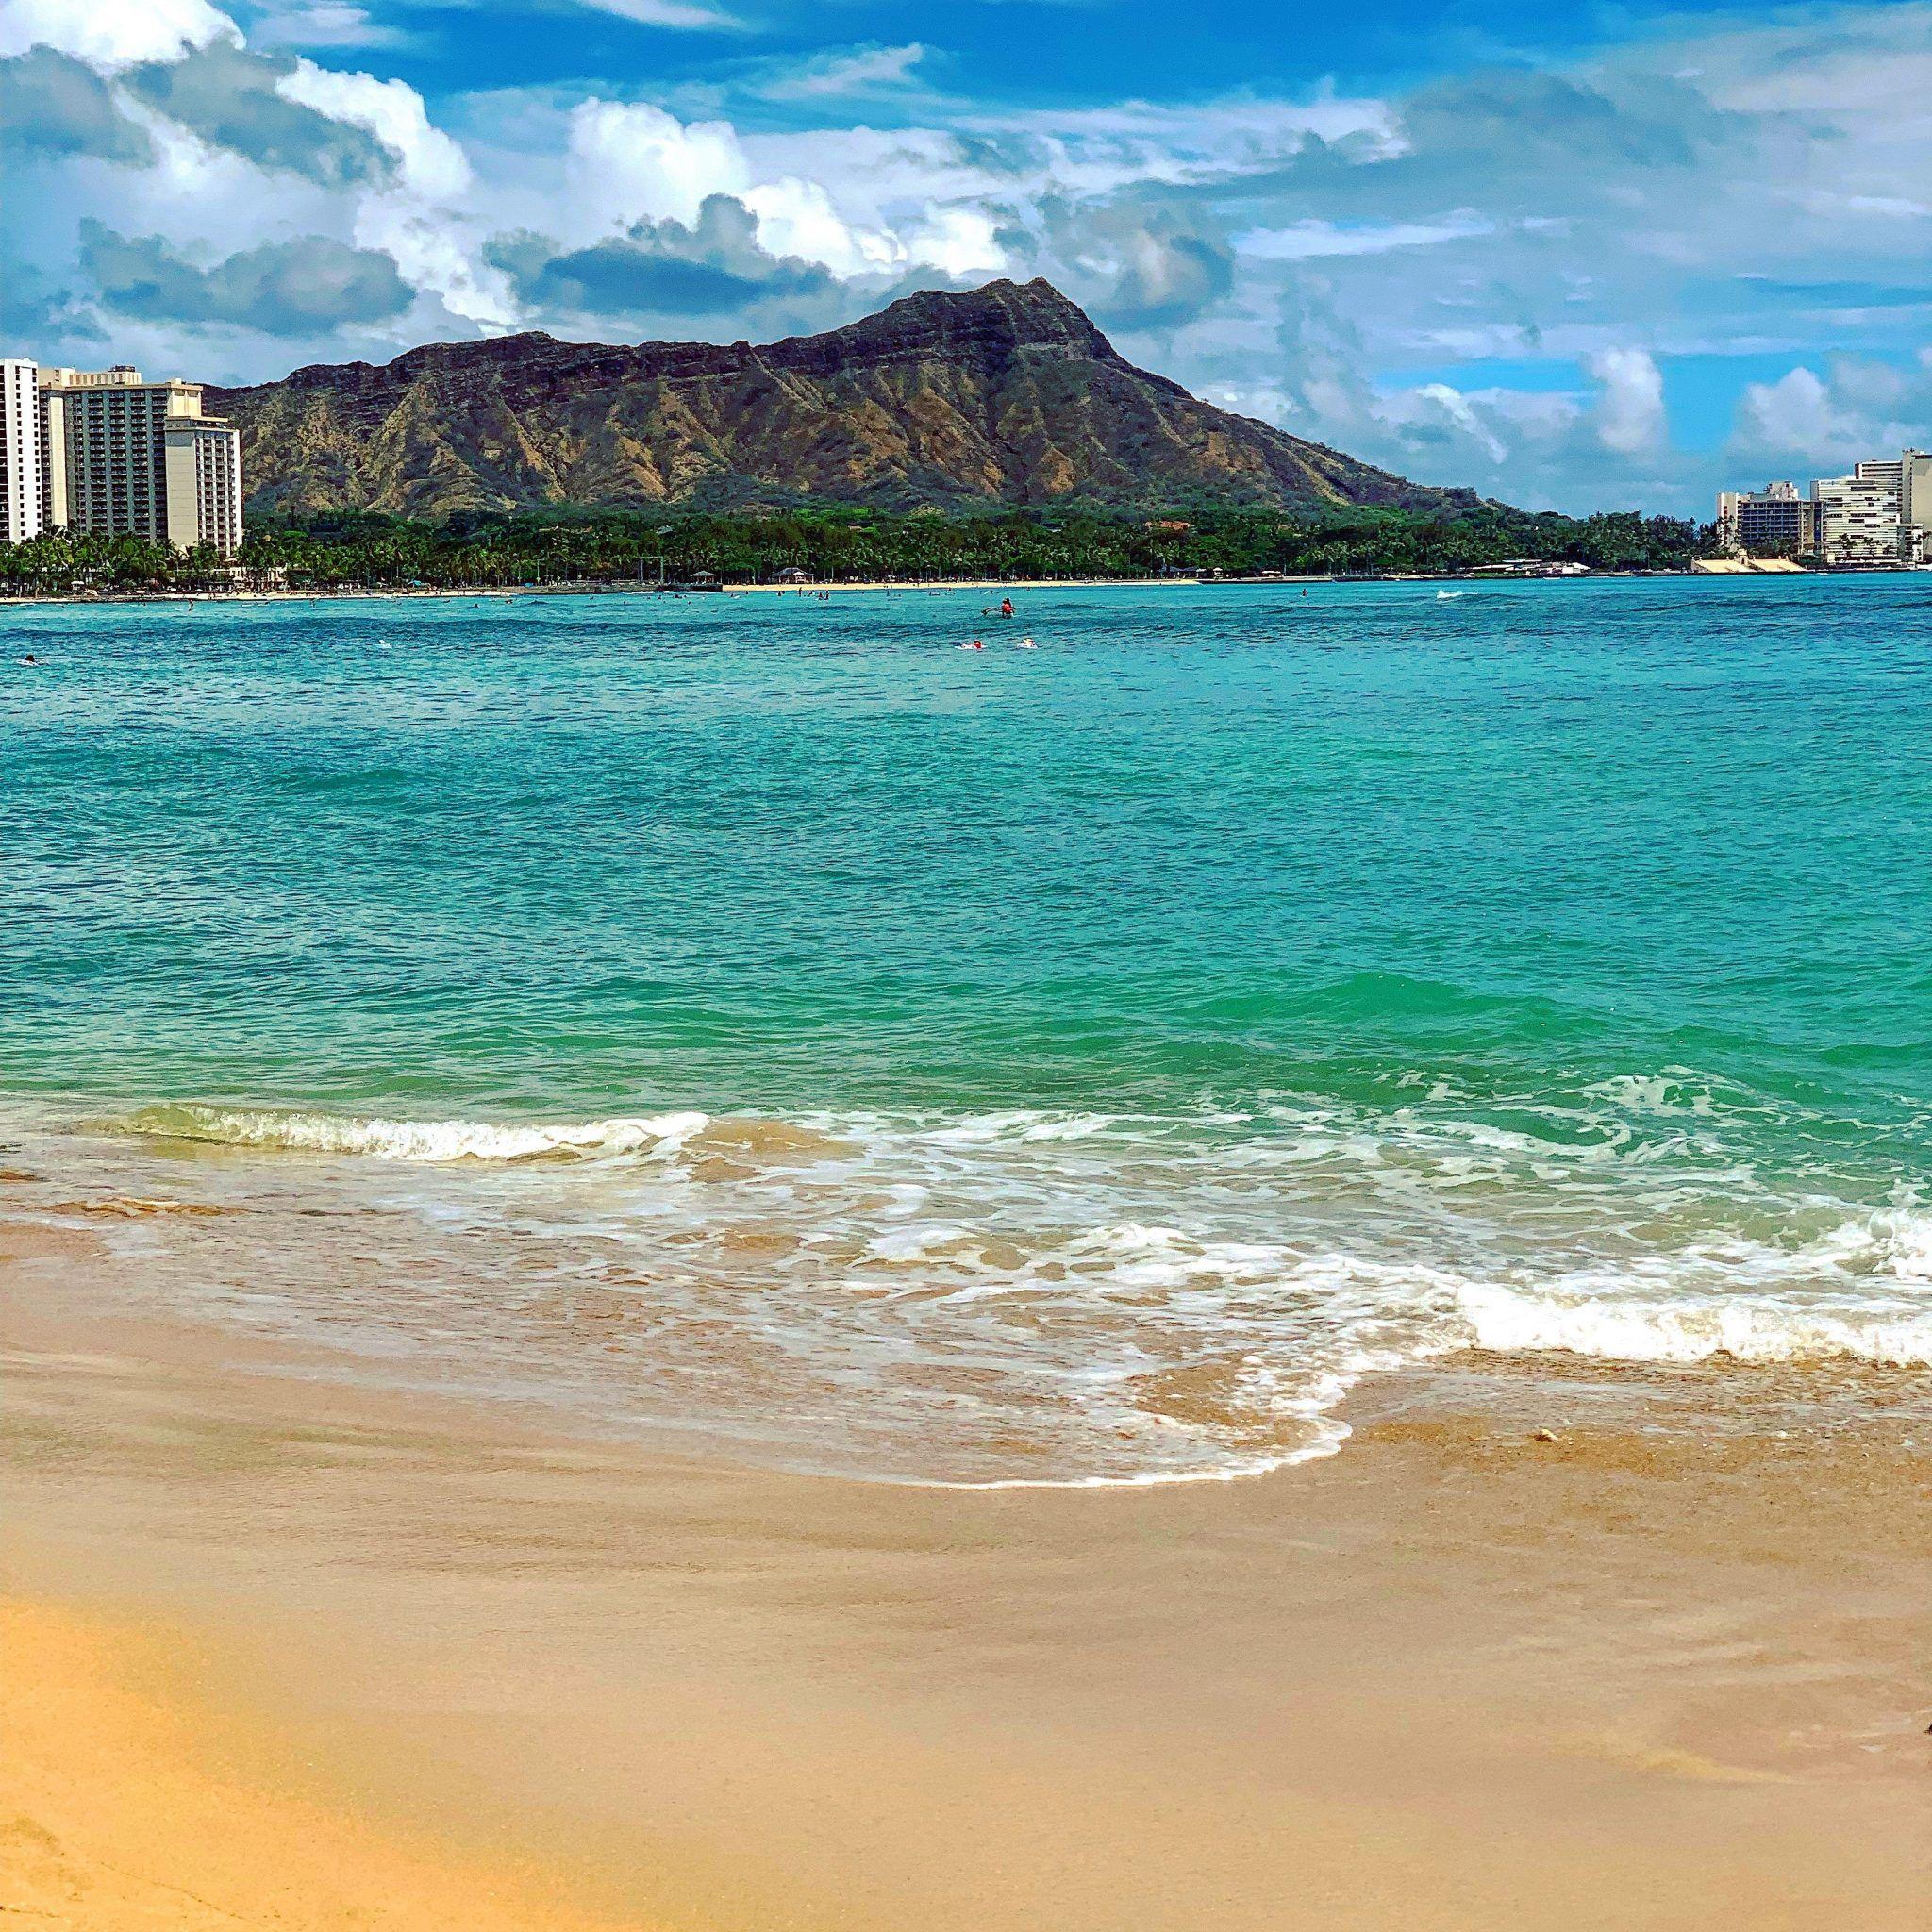 Top Things to Do in Oahu, Hawaii